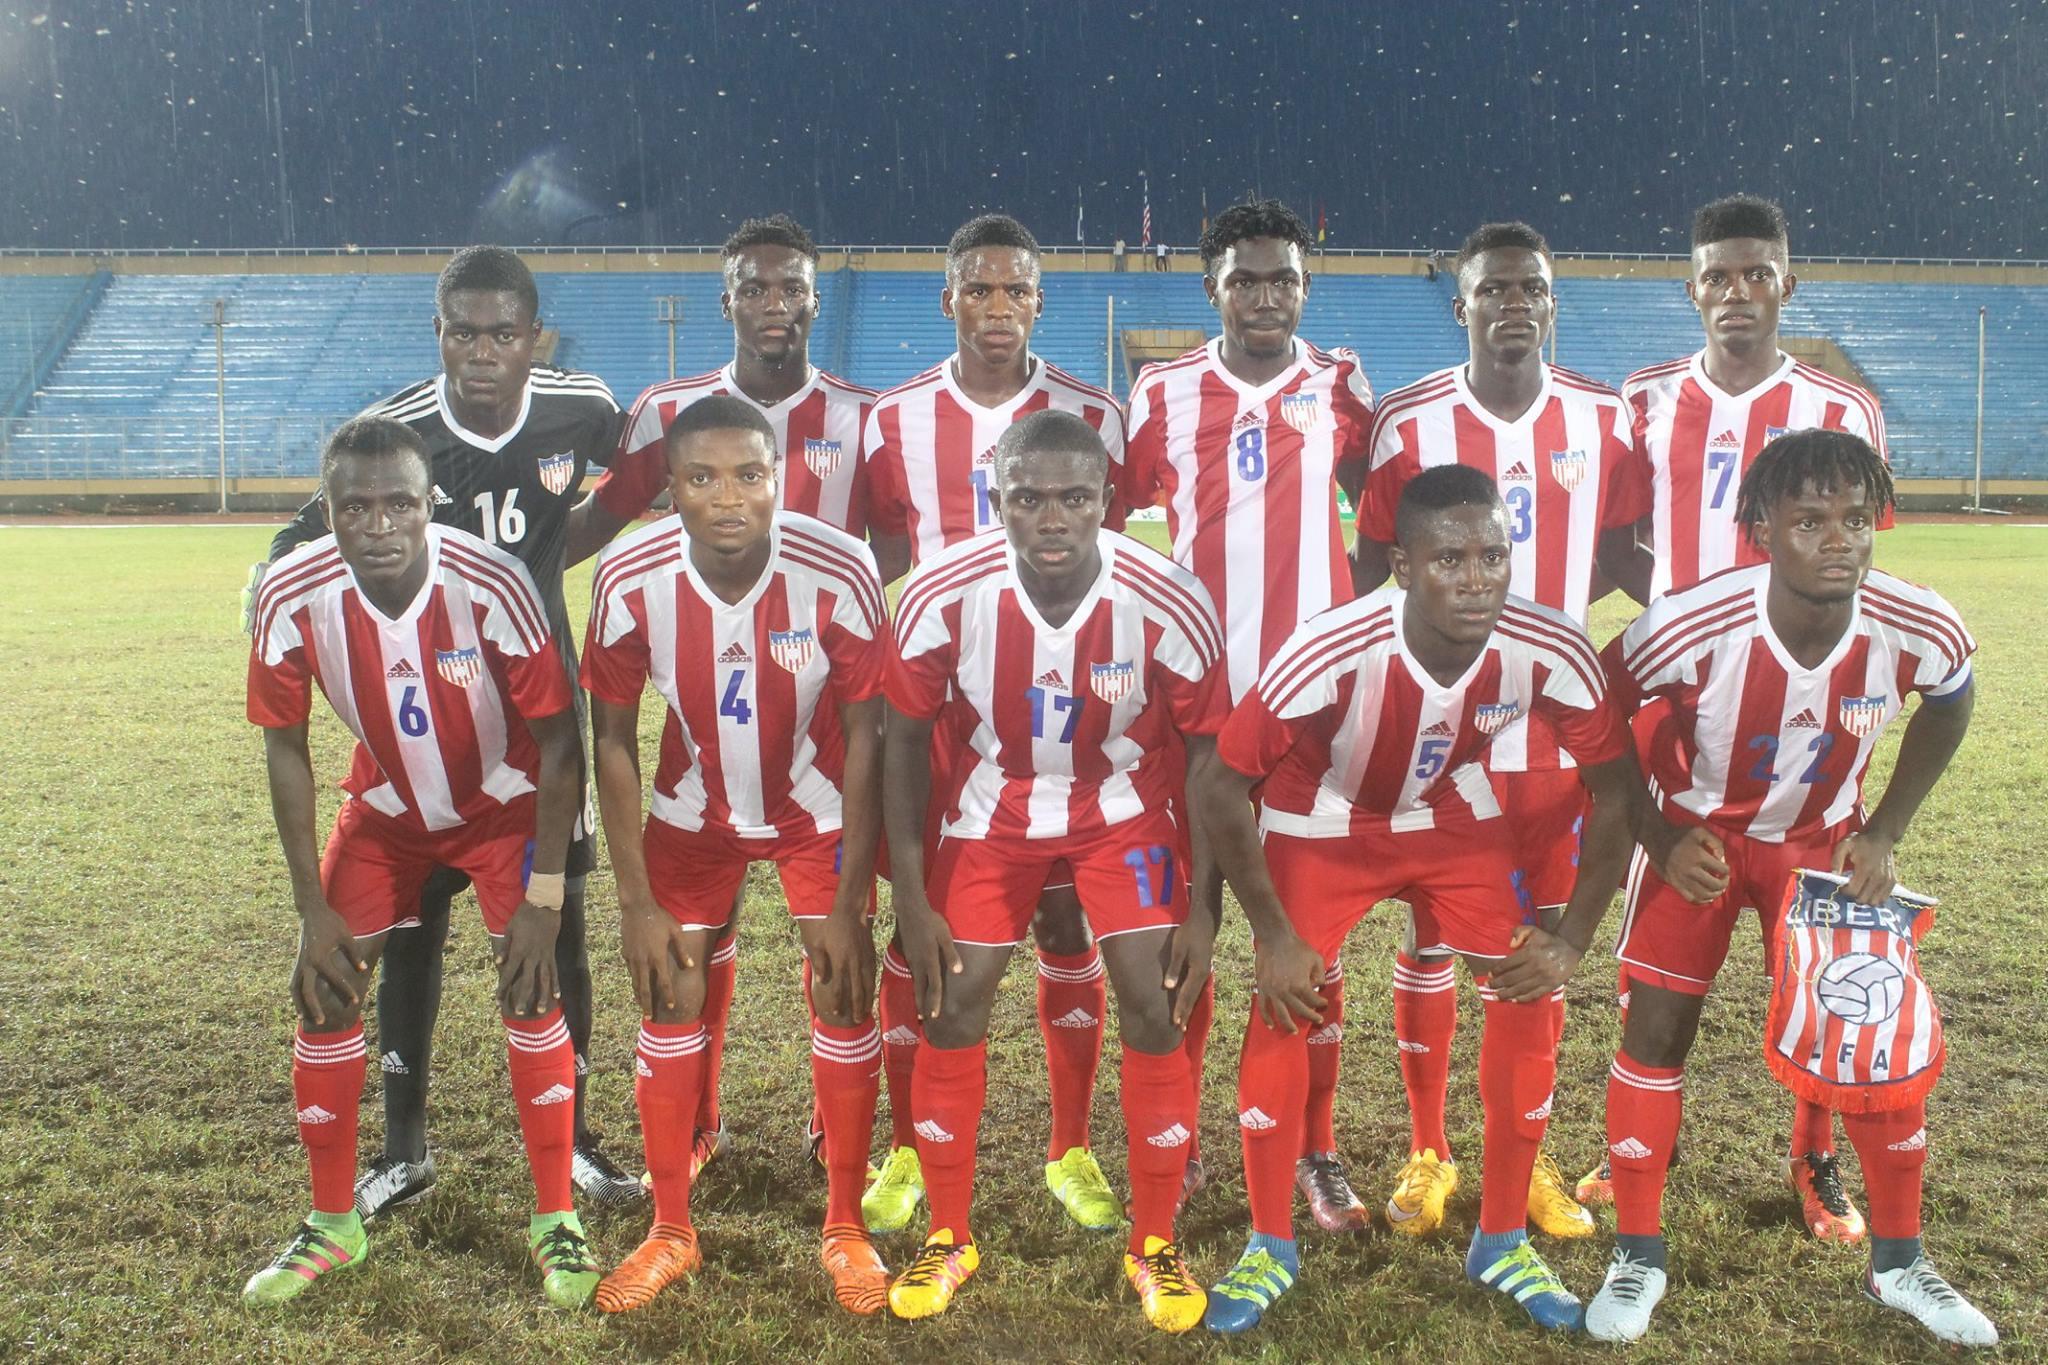 The Junior Lone Star of Liberia